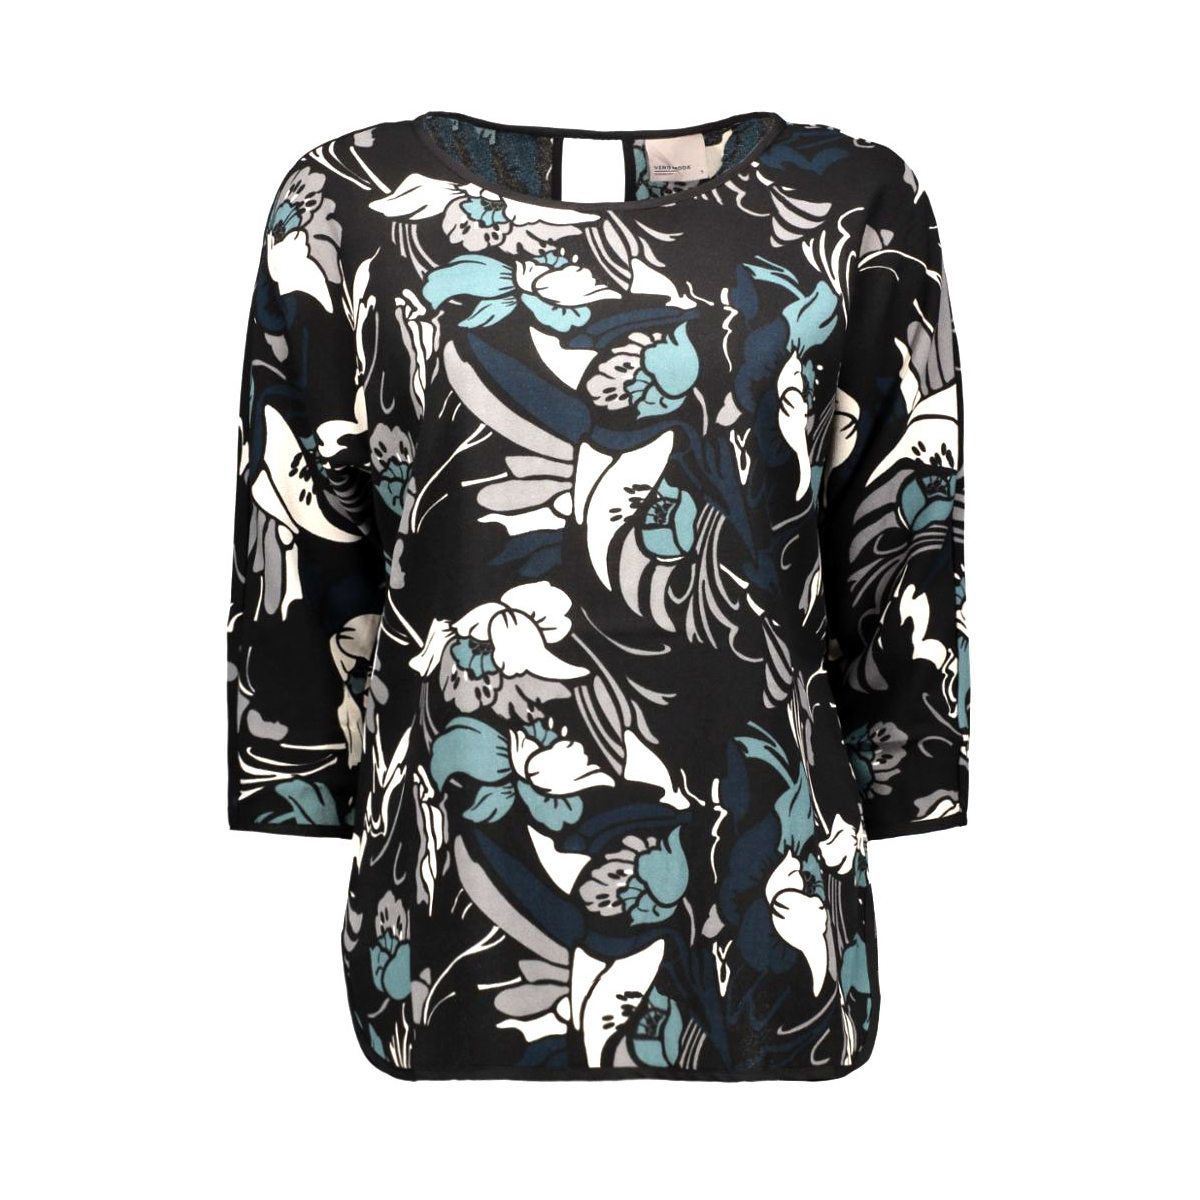 vmrebec 3/4 top 10170490 vero moda t-shirt black/blauwe bloem